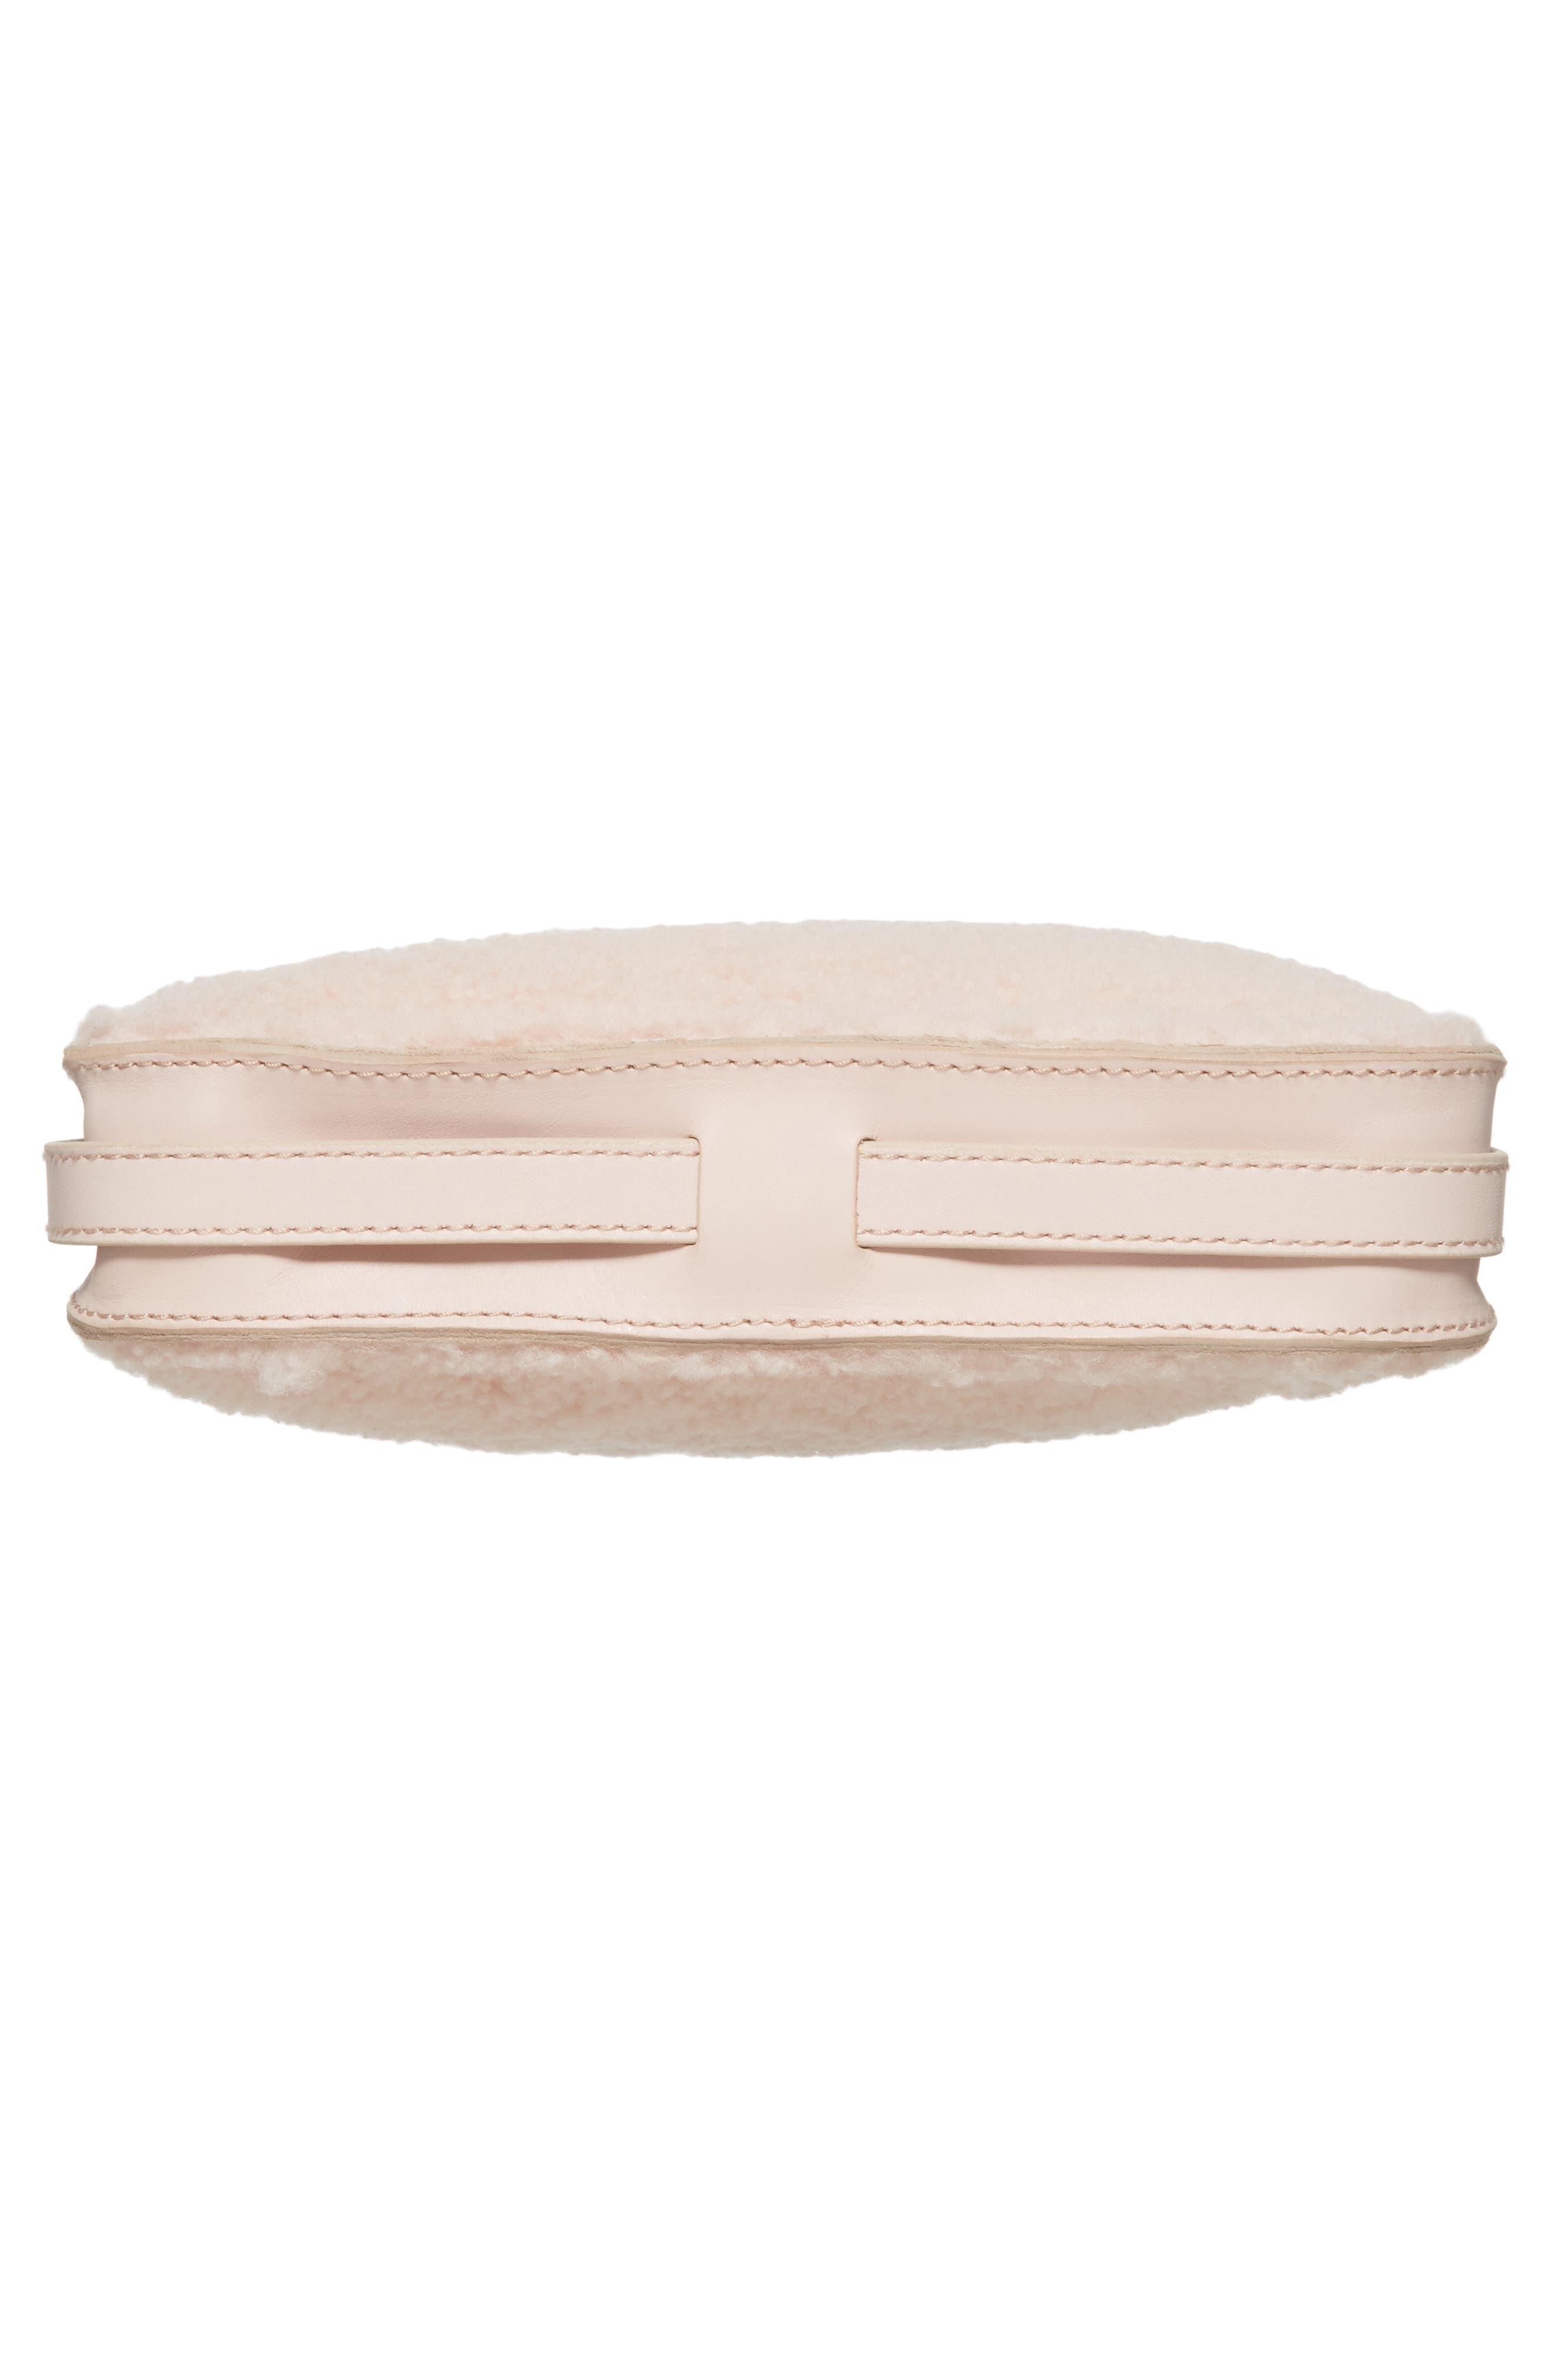 Simple Genuine Shearling Crossbody Bag,                             Alternate thumbnail 6, color,                             655